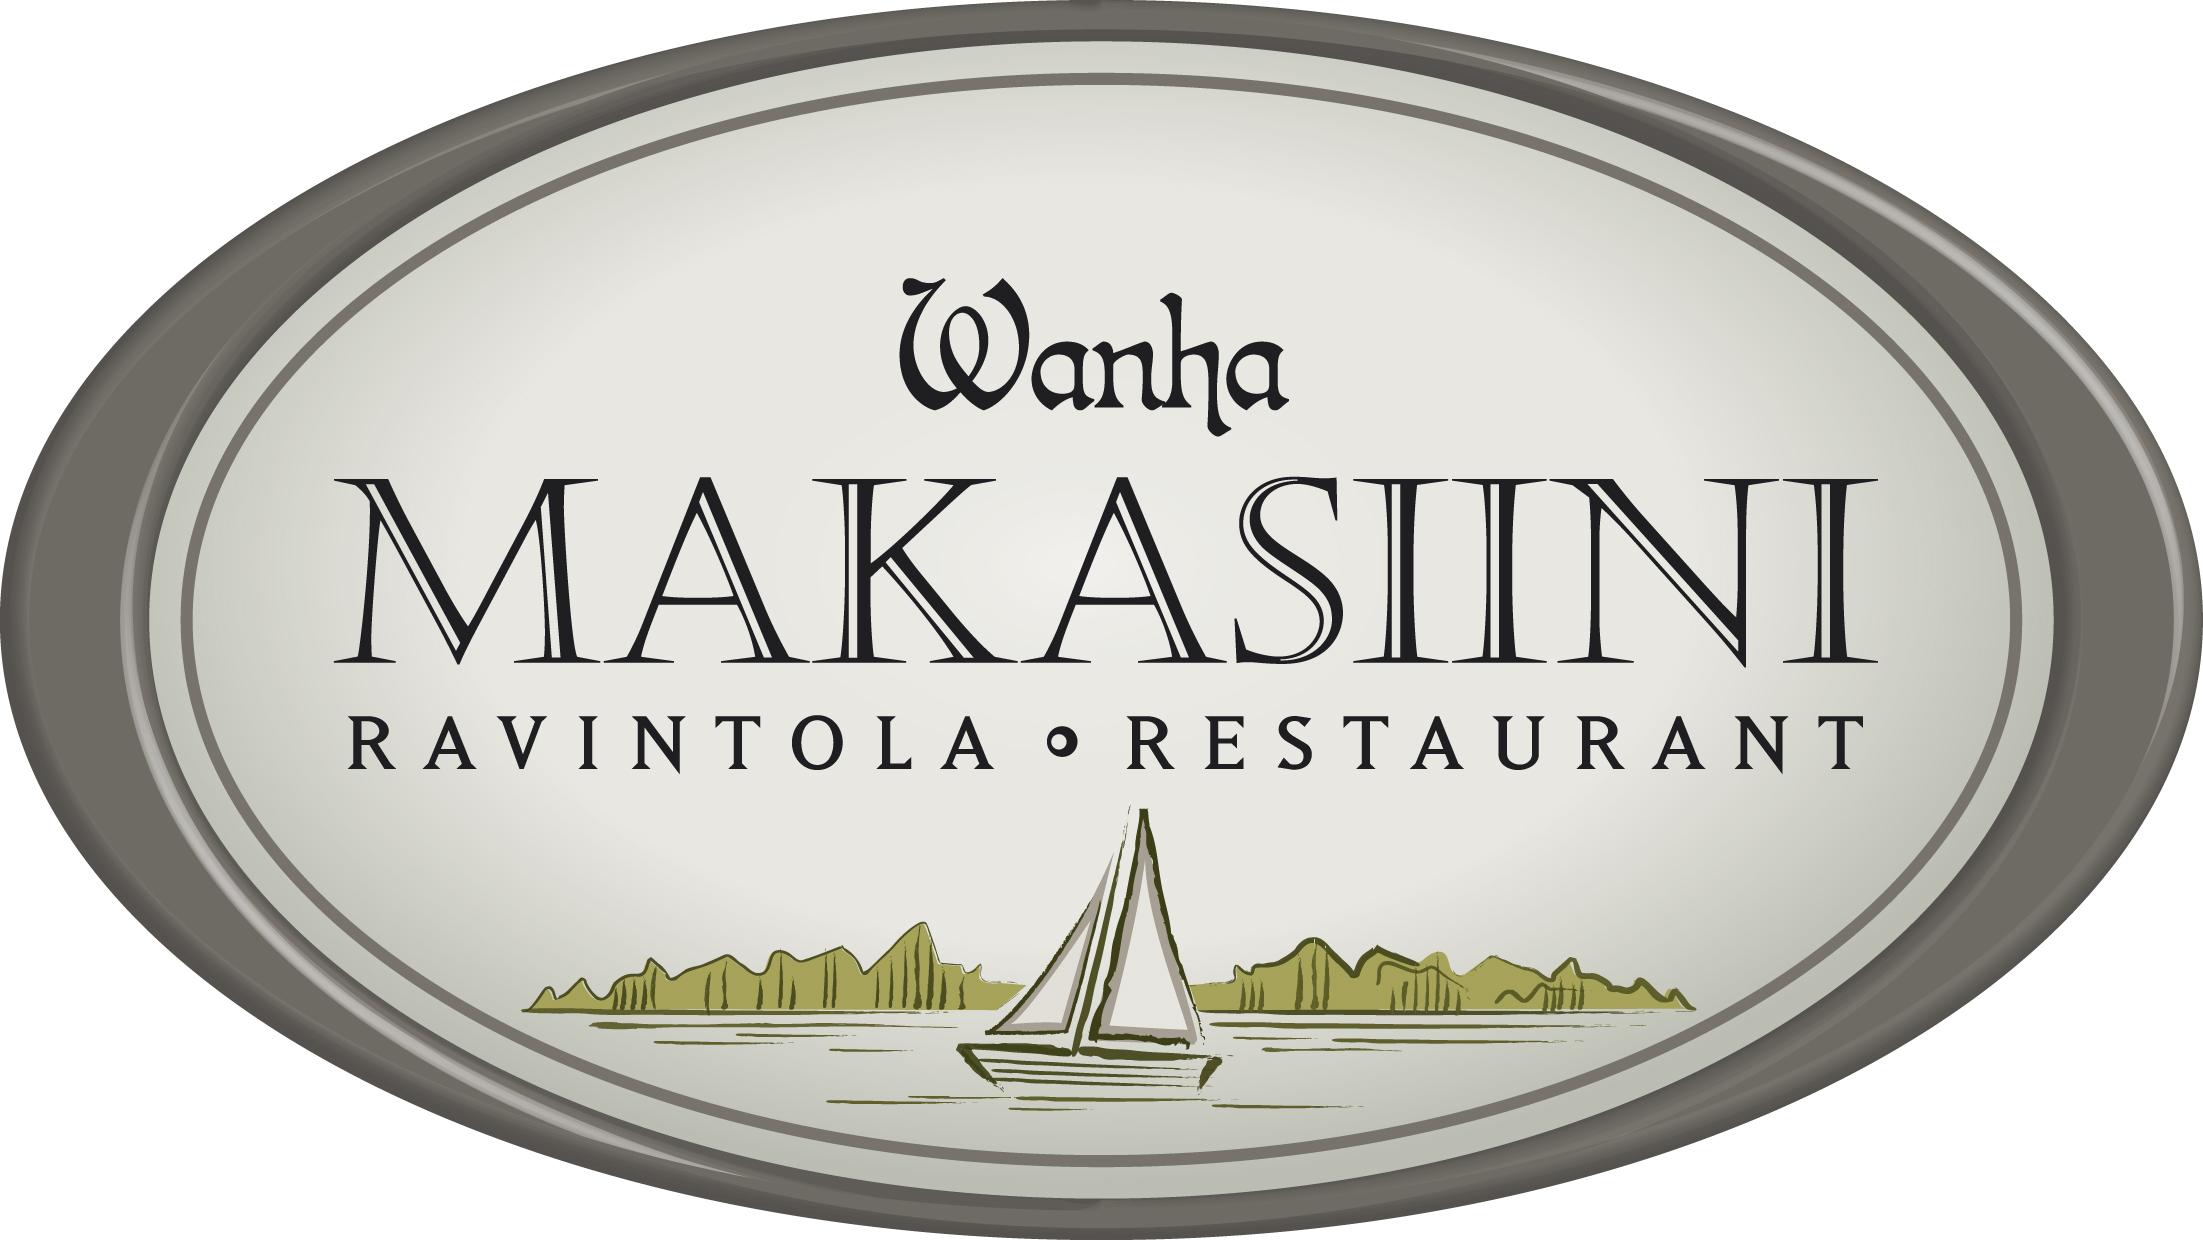 Ravintola Wanha Makasiini - Logo